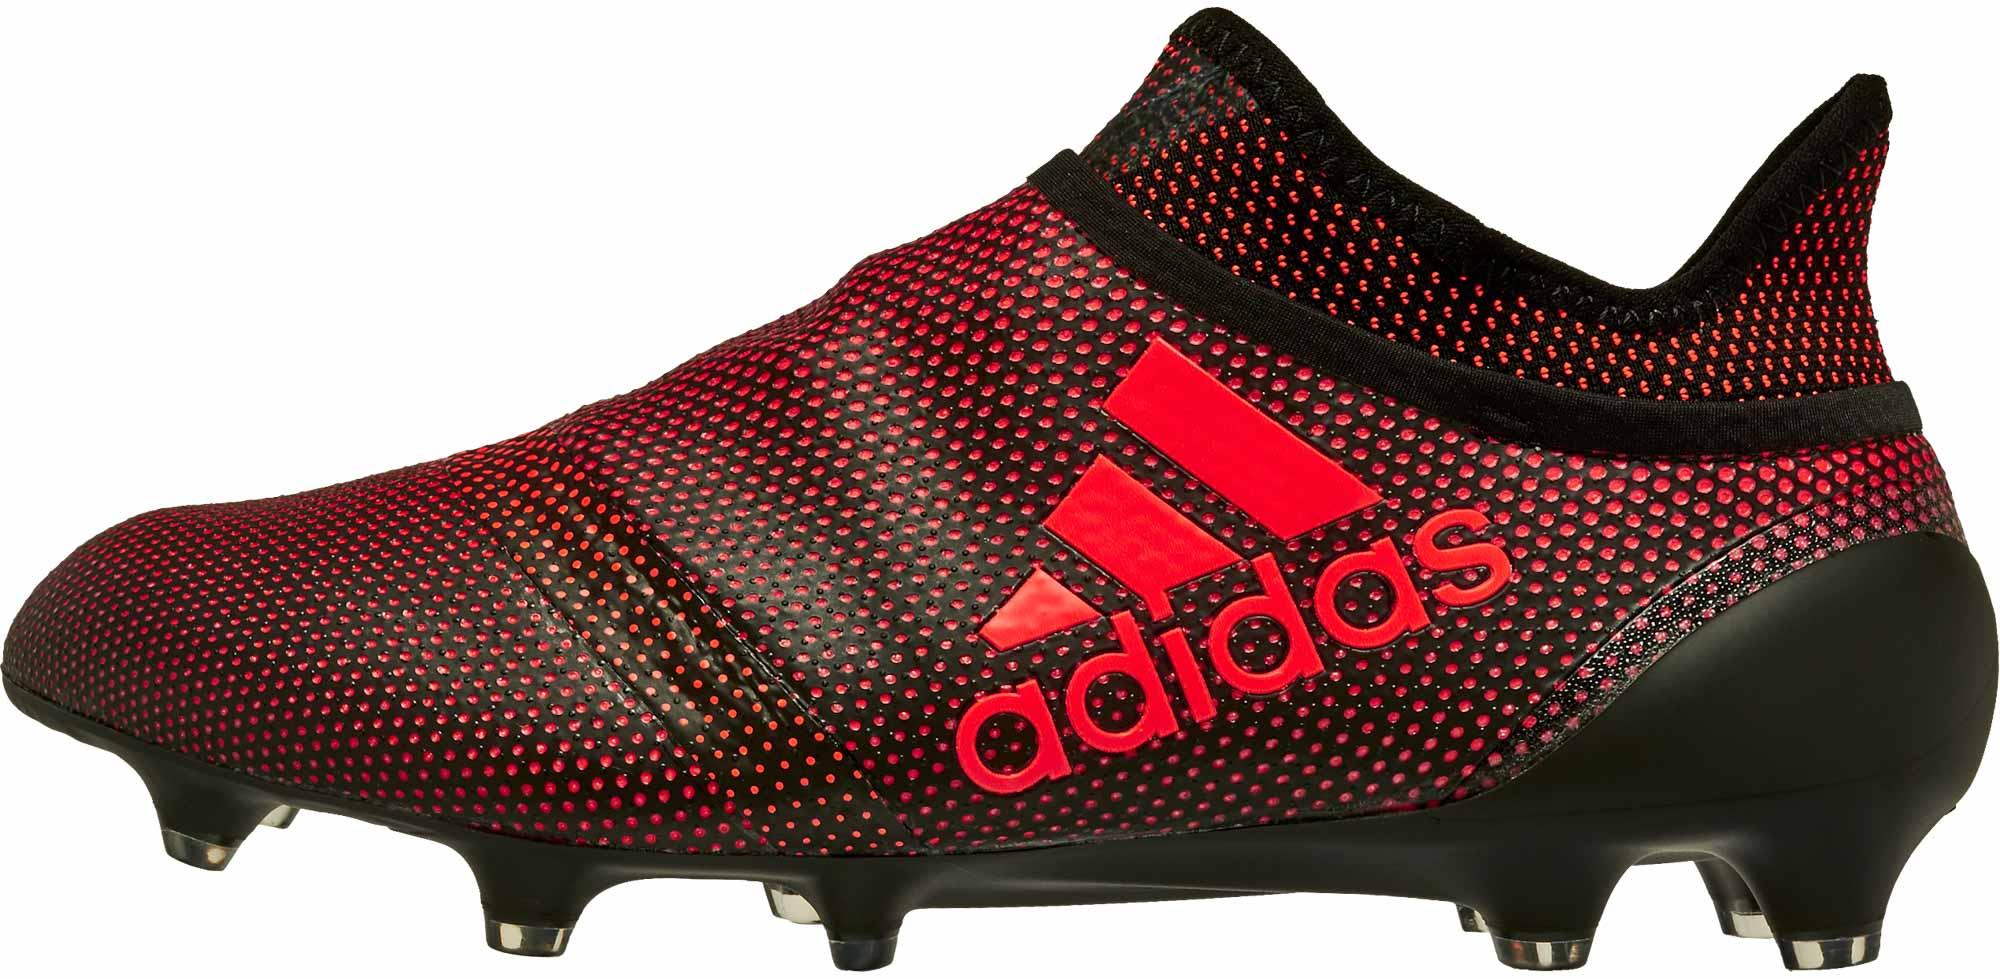 6f85f7f67 adidas X 17 PureSpeed FG - adidas X Soccer Cleats